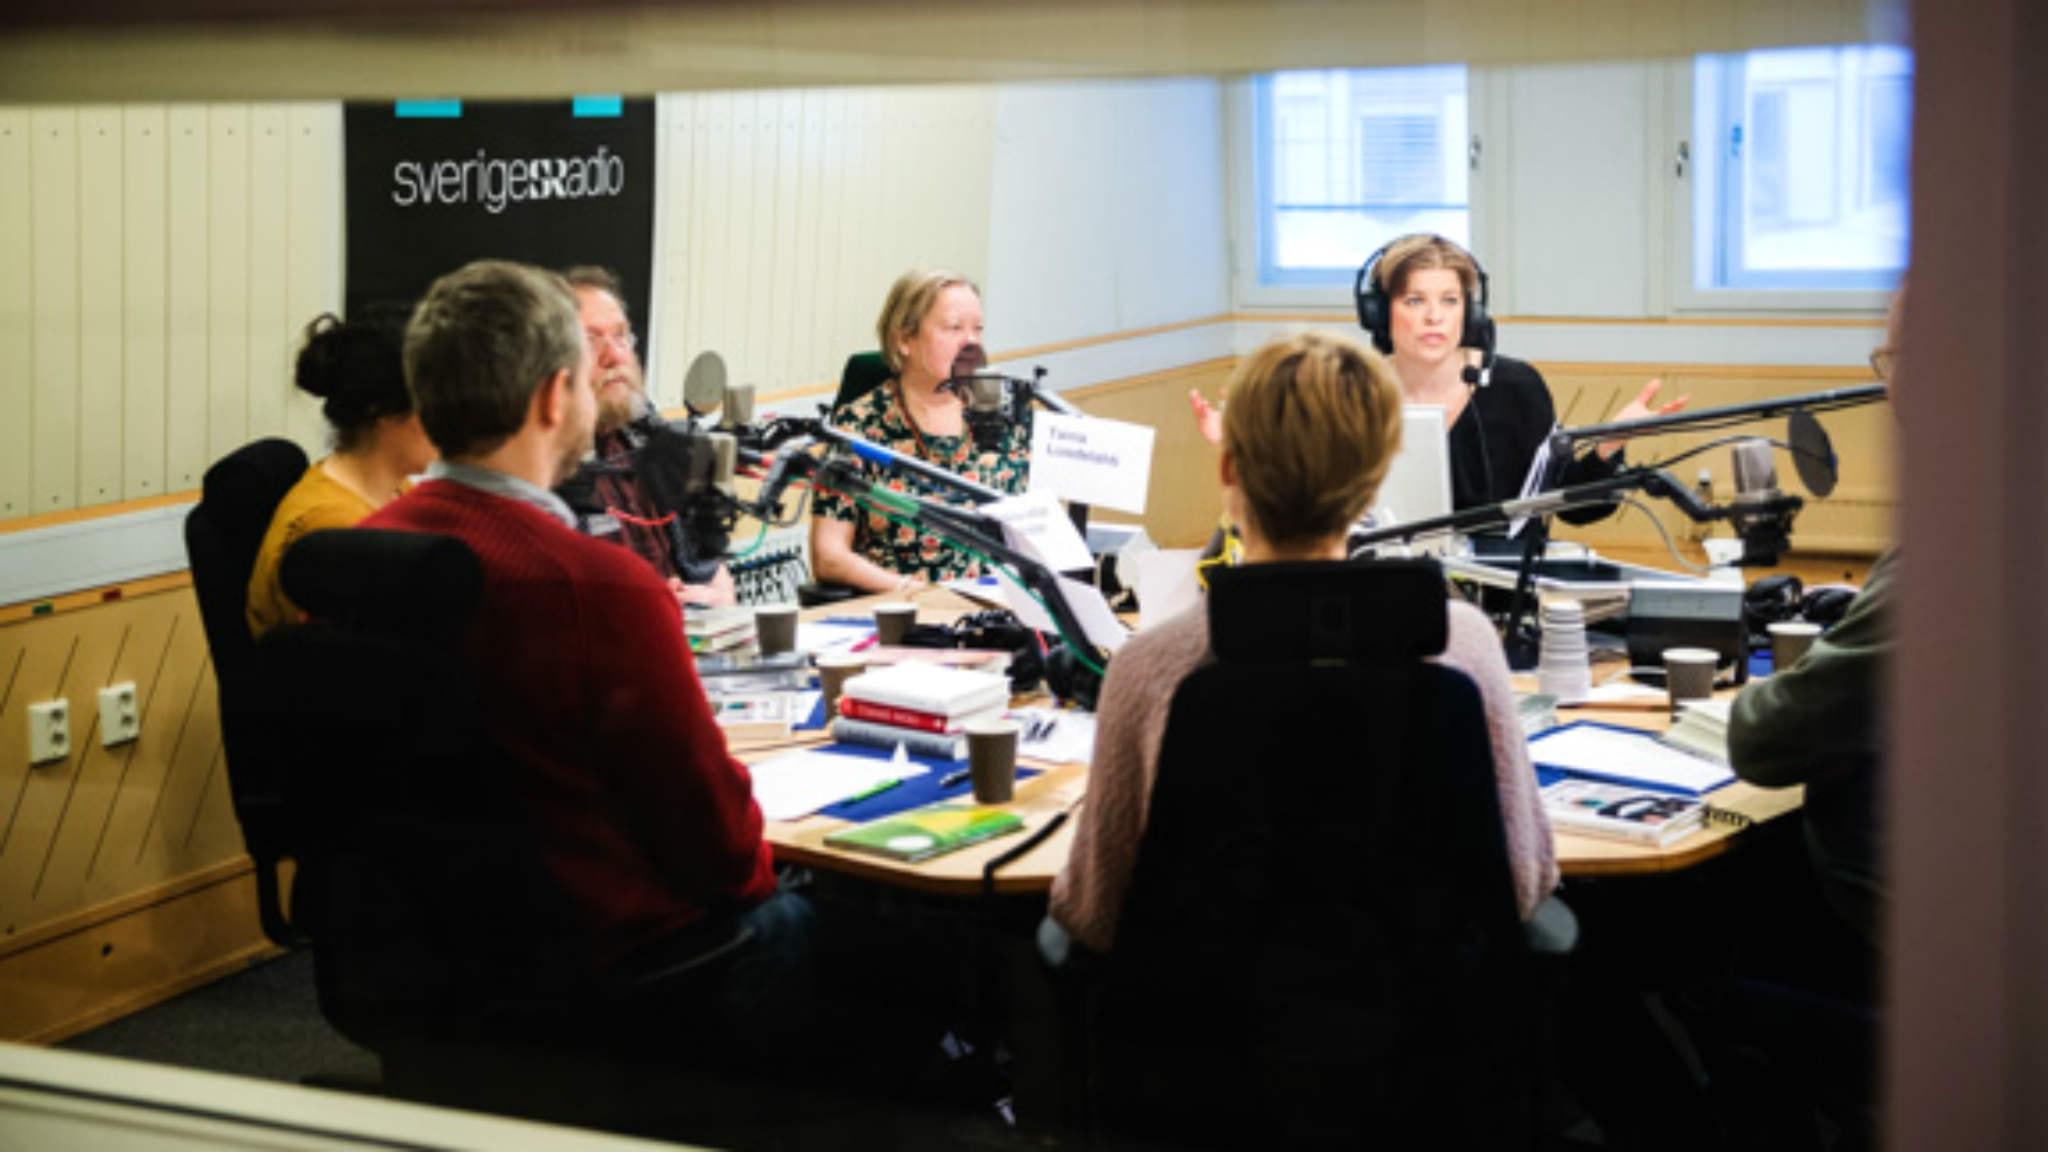 Lyssnarjuryn diskuterar finalisterna